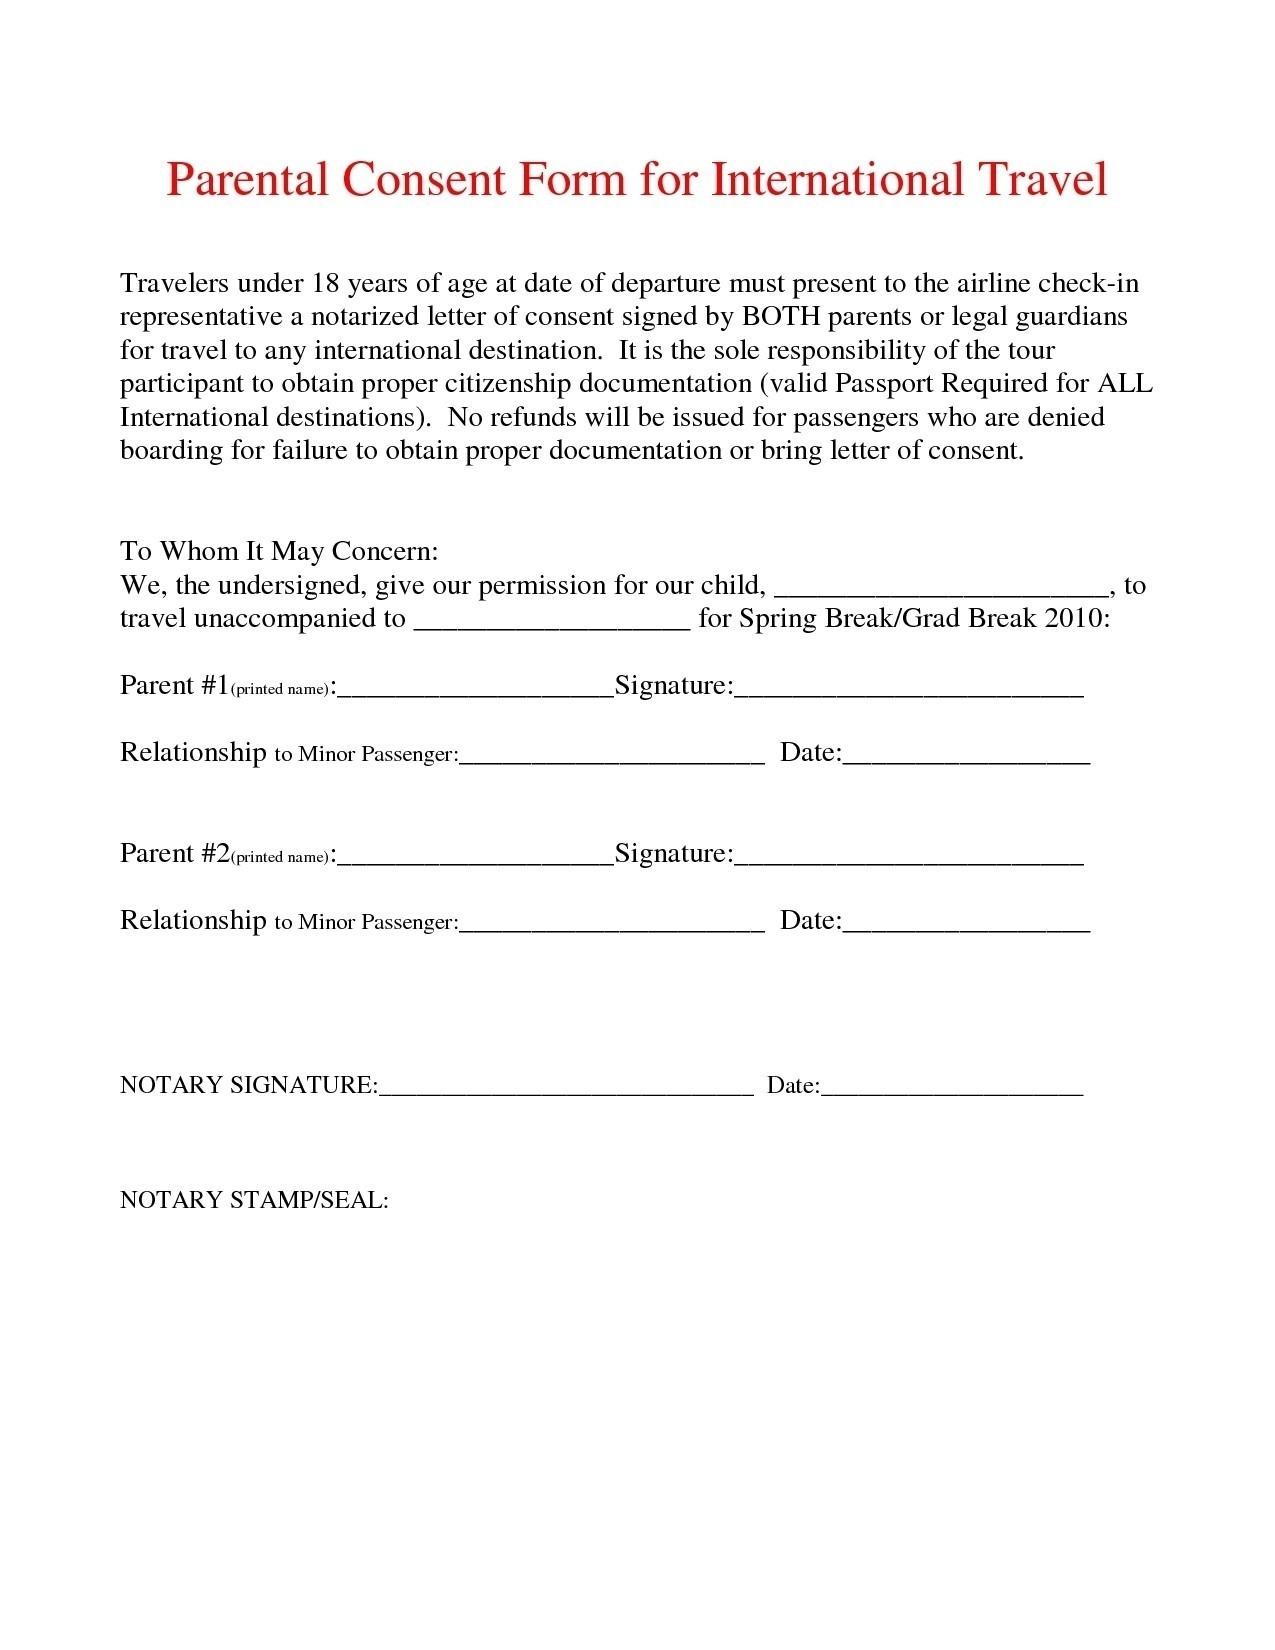 Parental Consent Permission Letter Template - Sample Permission Letter to Travel Best Notarized Letter